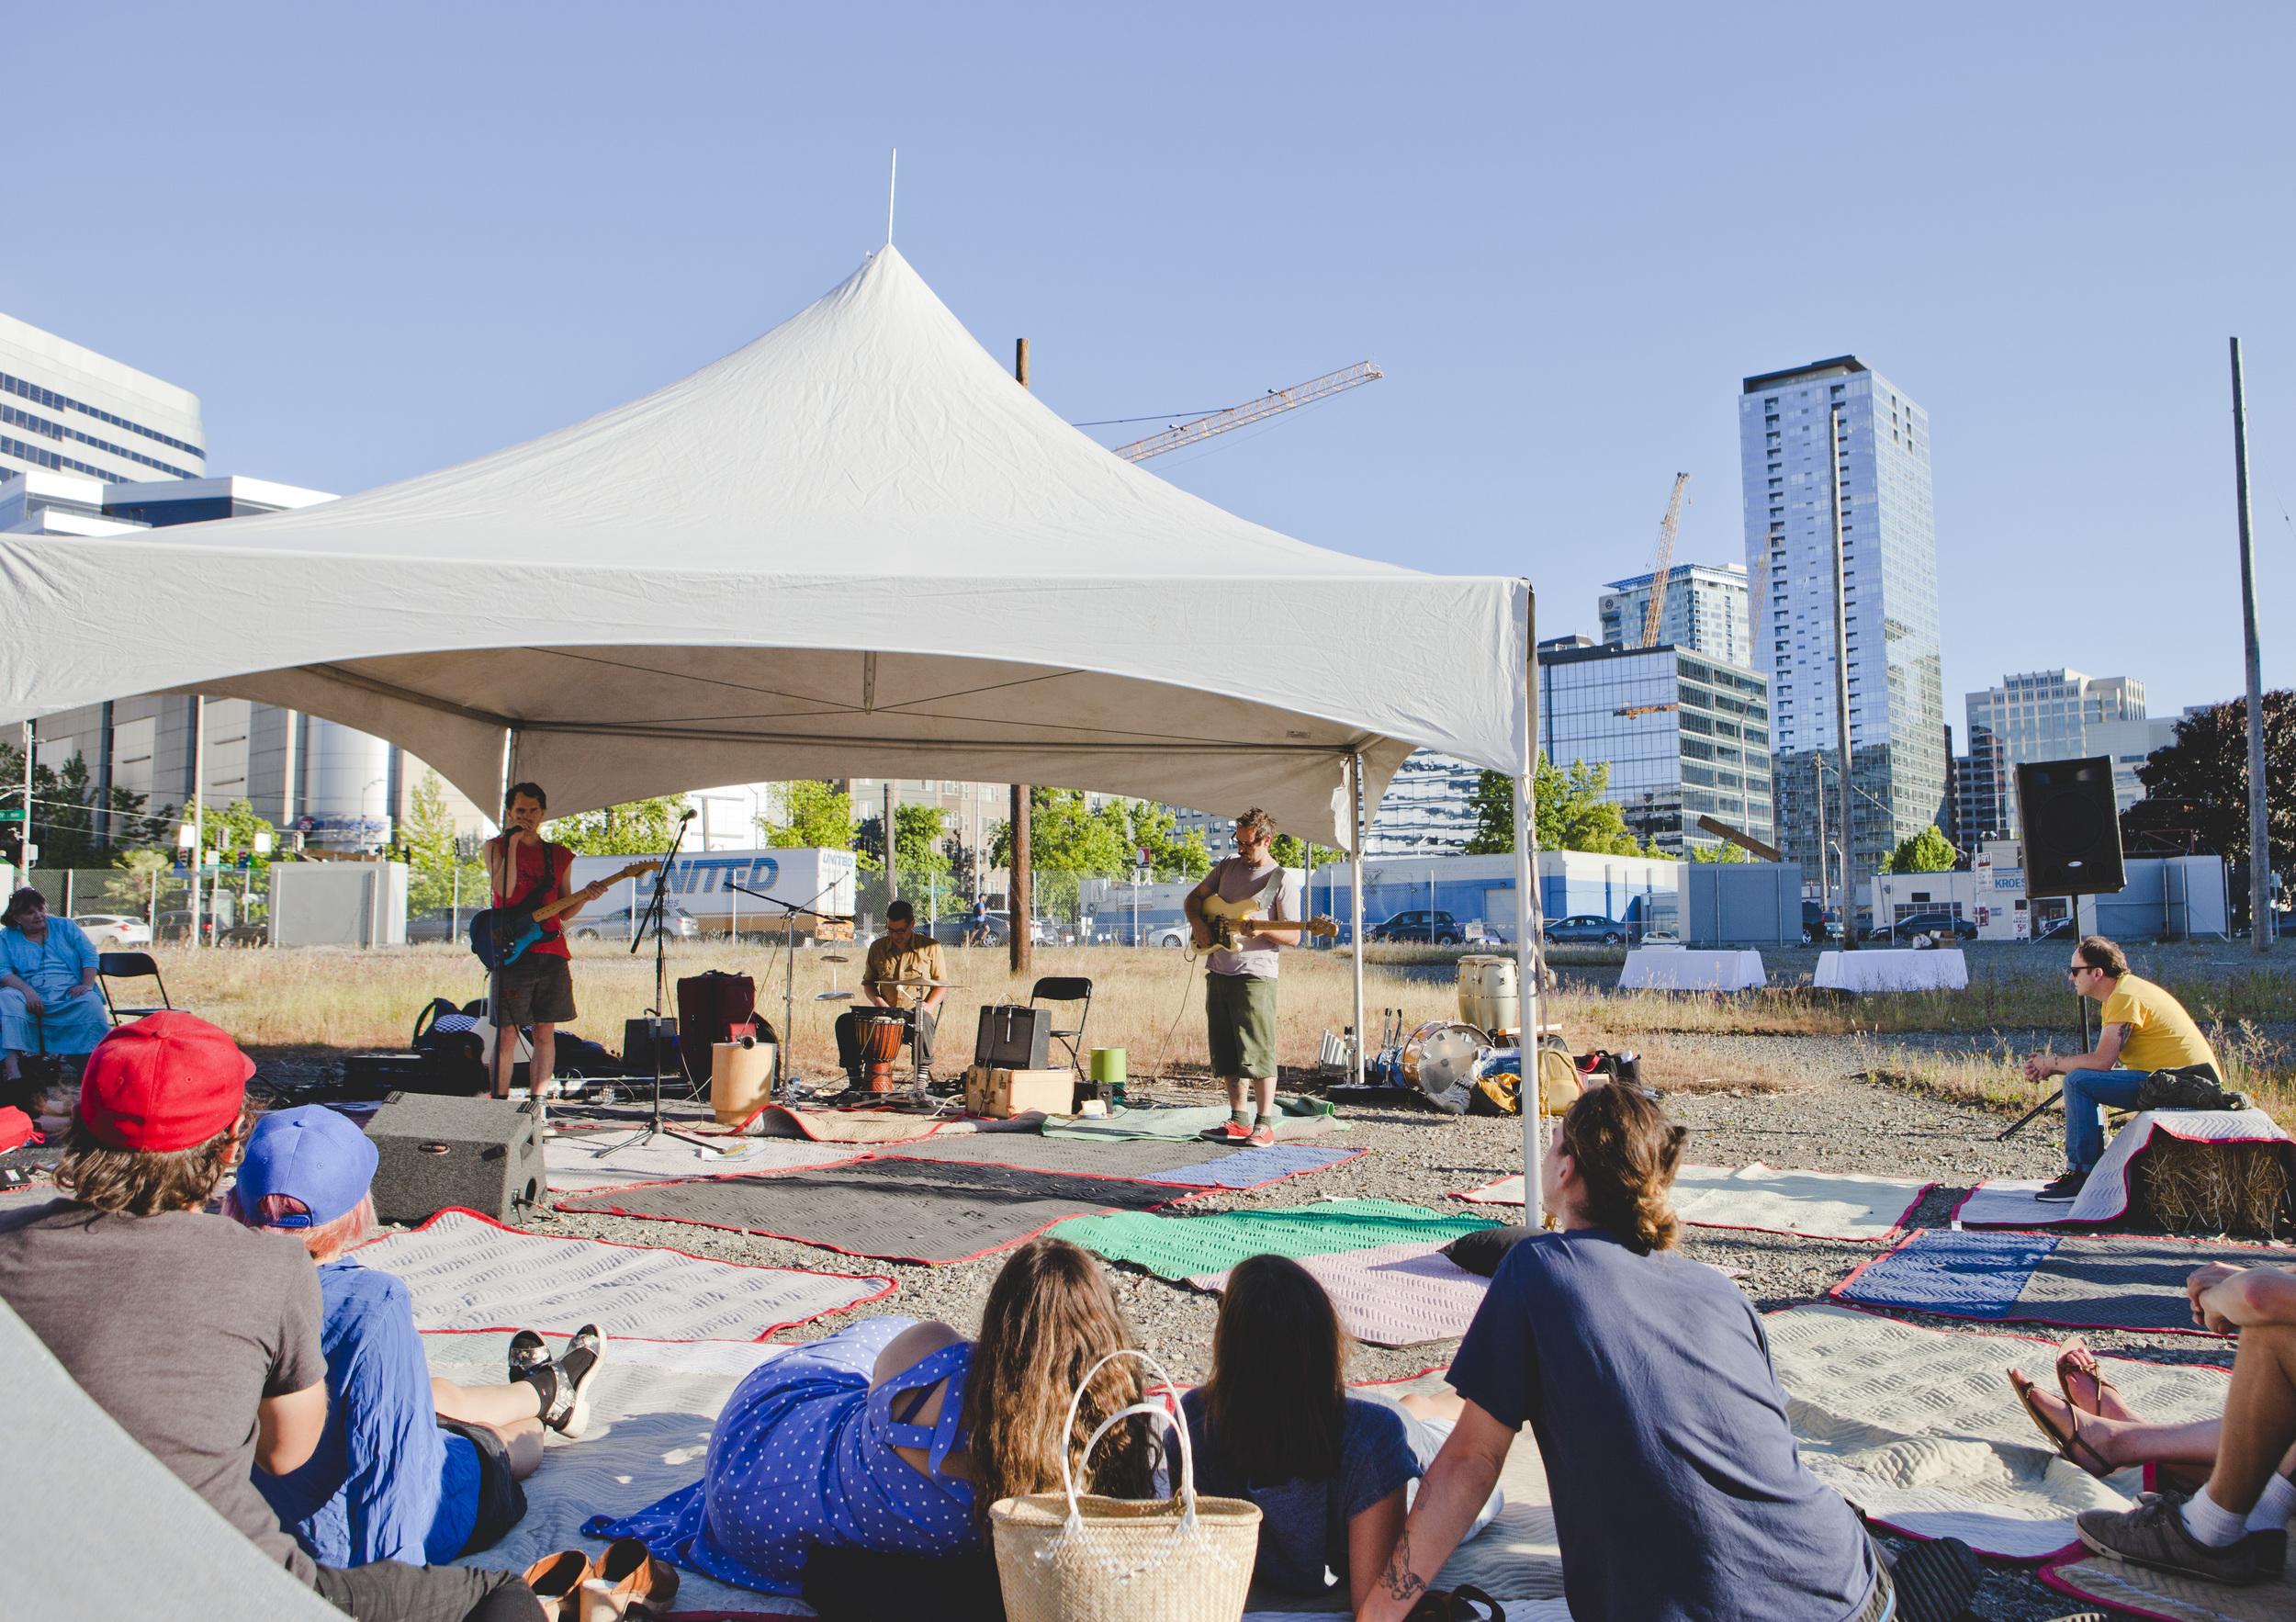 Chris Johanson's Quiet Music Festival of Portland in Seattle